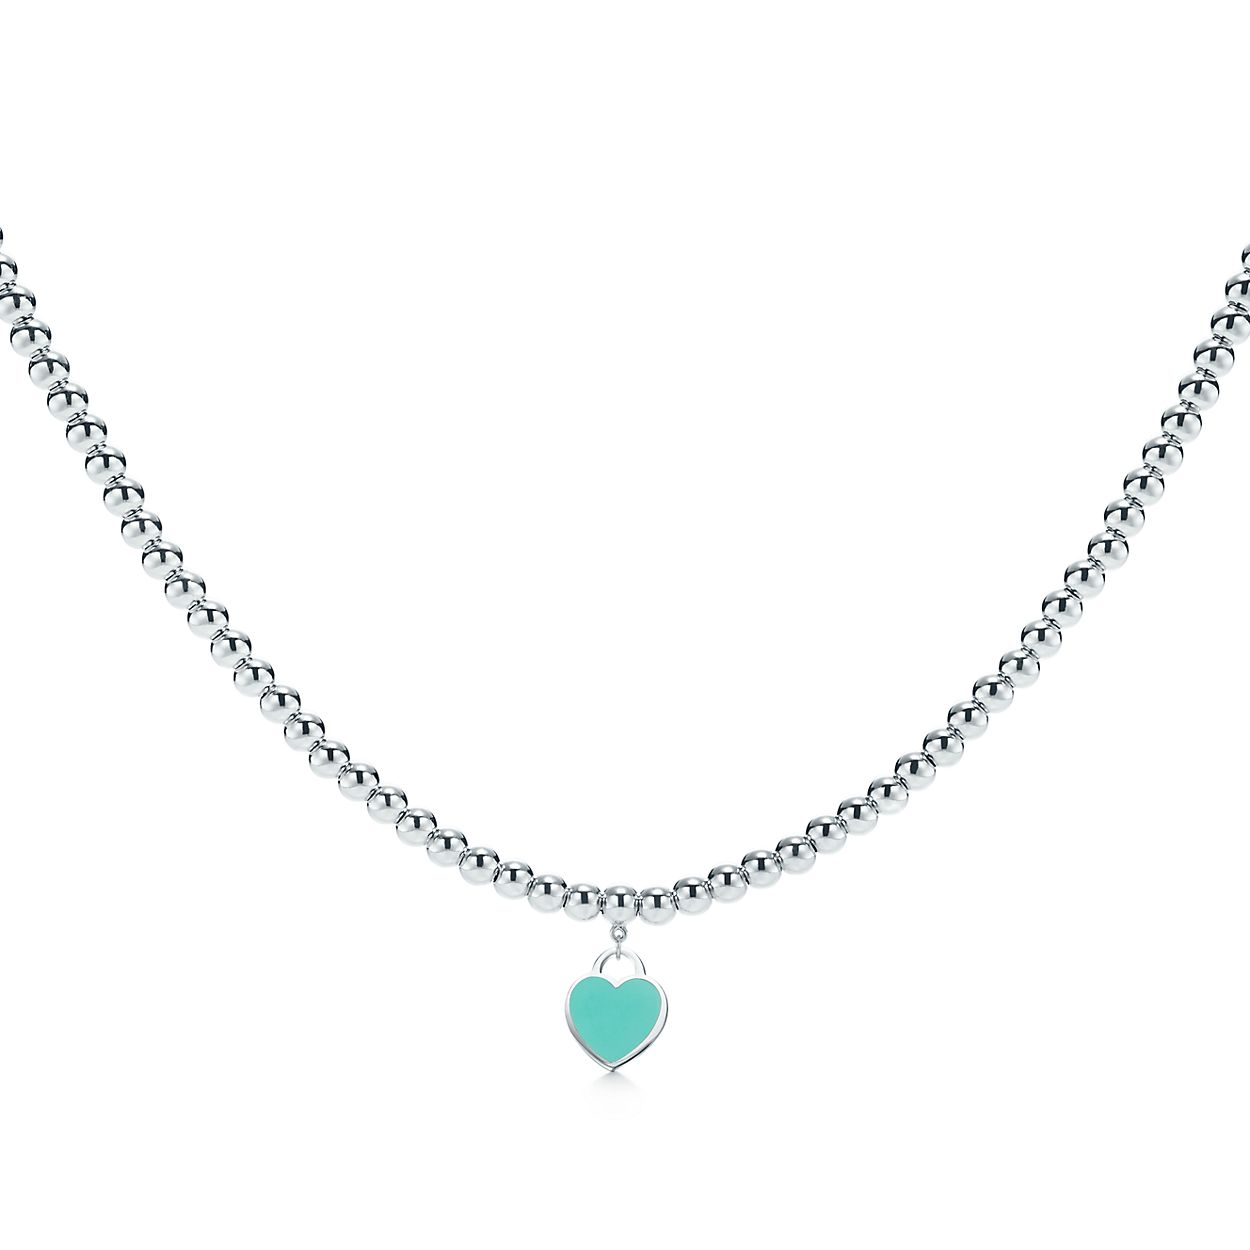 Chaîne De Perles Mixte En Argent Et Or Rose 18 Carats Tiffany   Co.  IukcXp2Wu 262a297af915